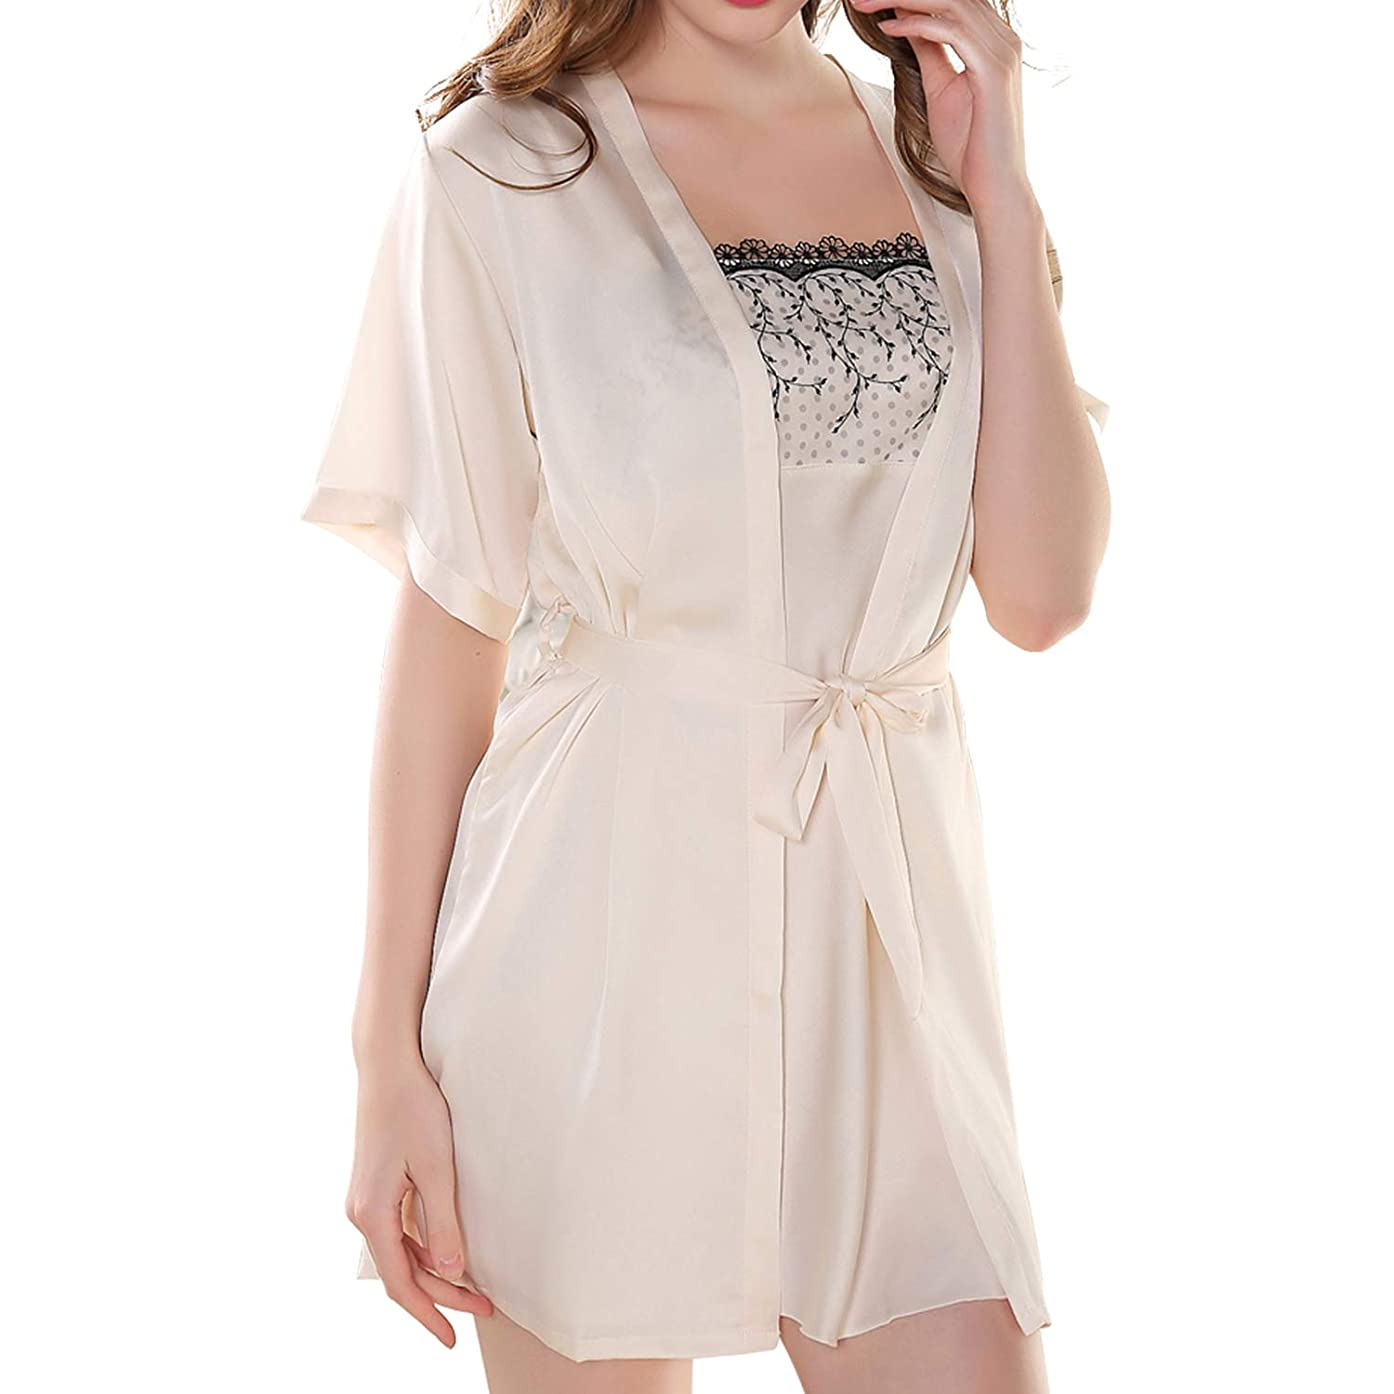 S~M Women's Lace Satin Silk Nightgown Robe with Full Slip Sexy Chemise Lingerie Pajamas Set Sleepwear Loungewear